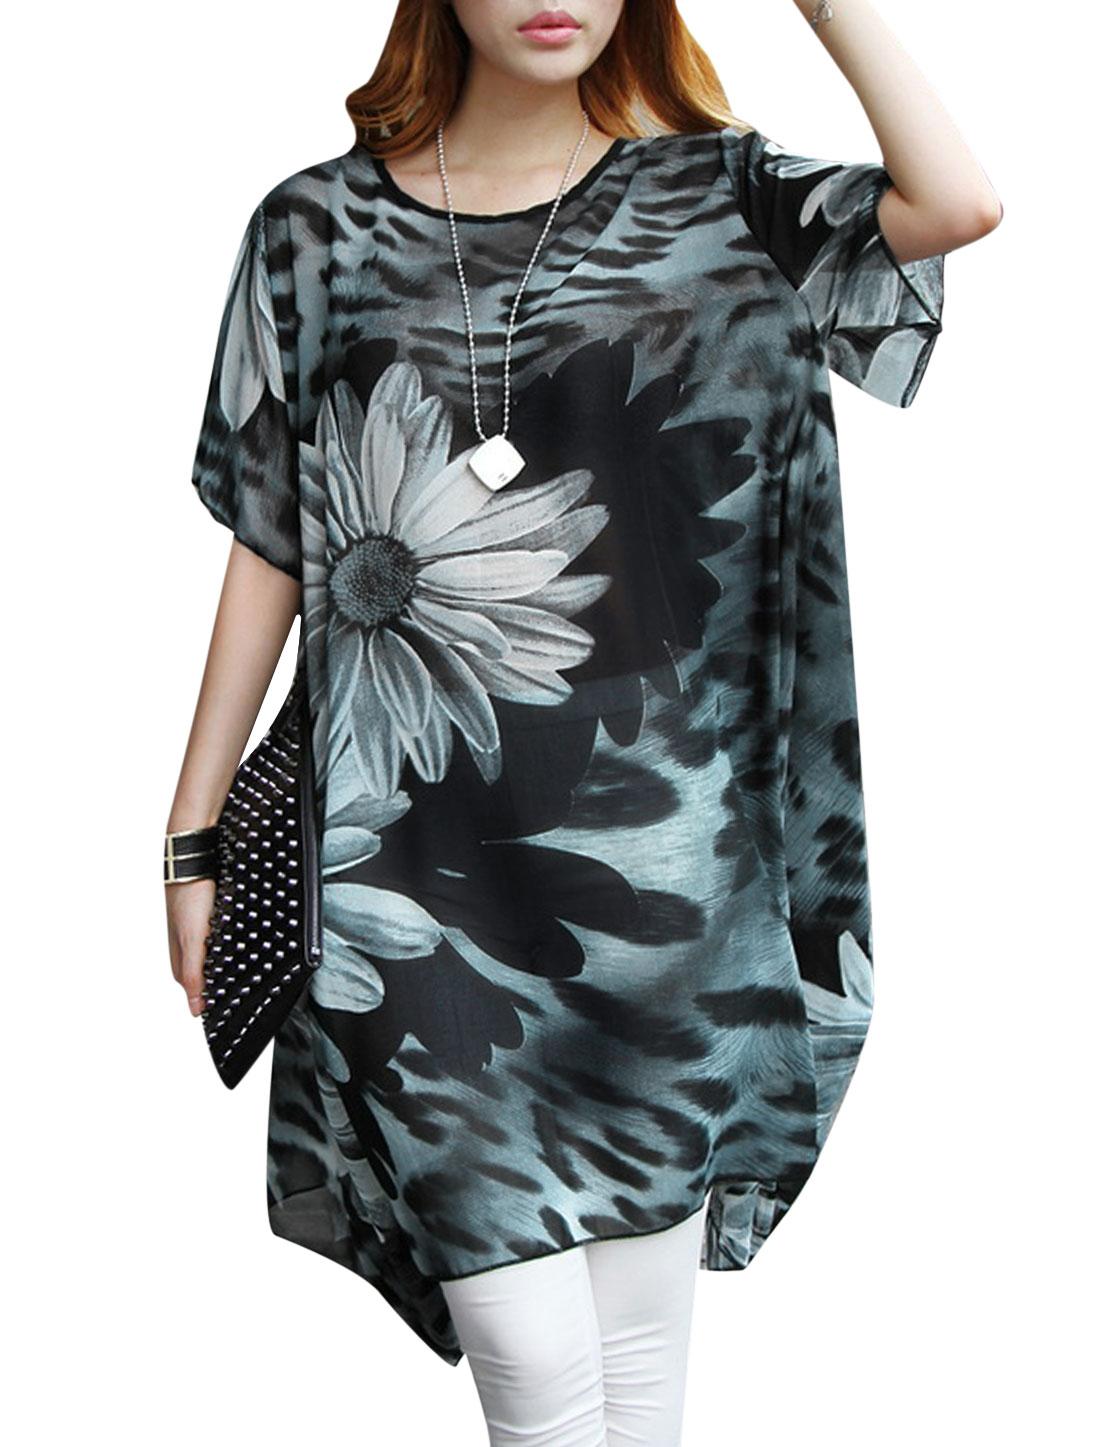 Lady Short Sleeve Floral Prints Semi Sheer Loose Tunic Top Black Dark Gray S